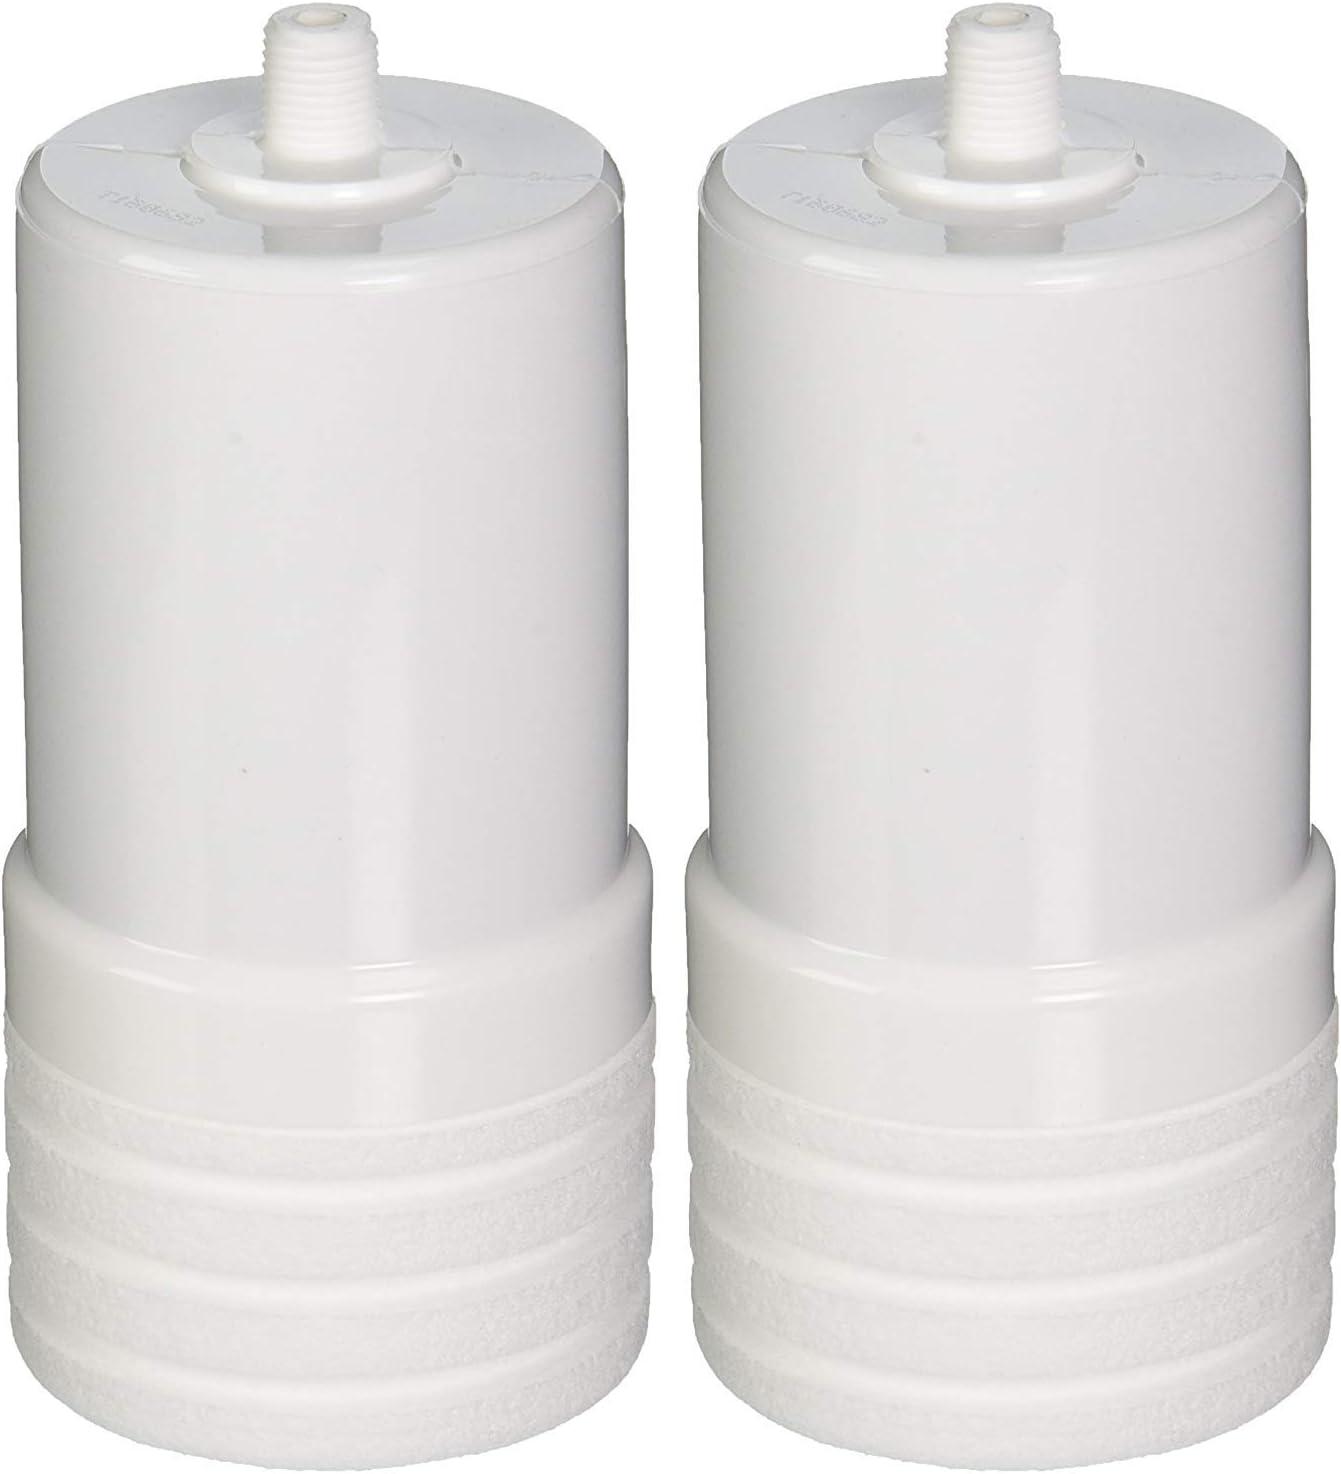 Вundlе оf Тhrее Aqua-Pure 70020318823 AP217 4629002 Under Sink Replacement Filter Cartridge